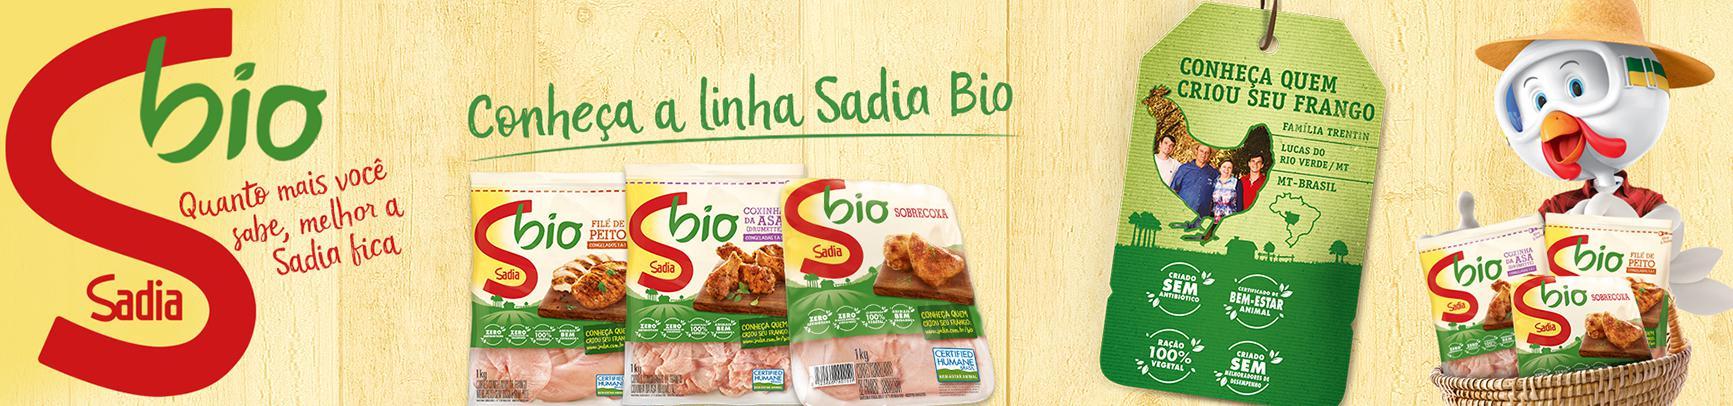 banner sadia bio